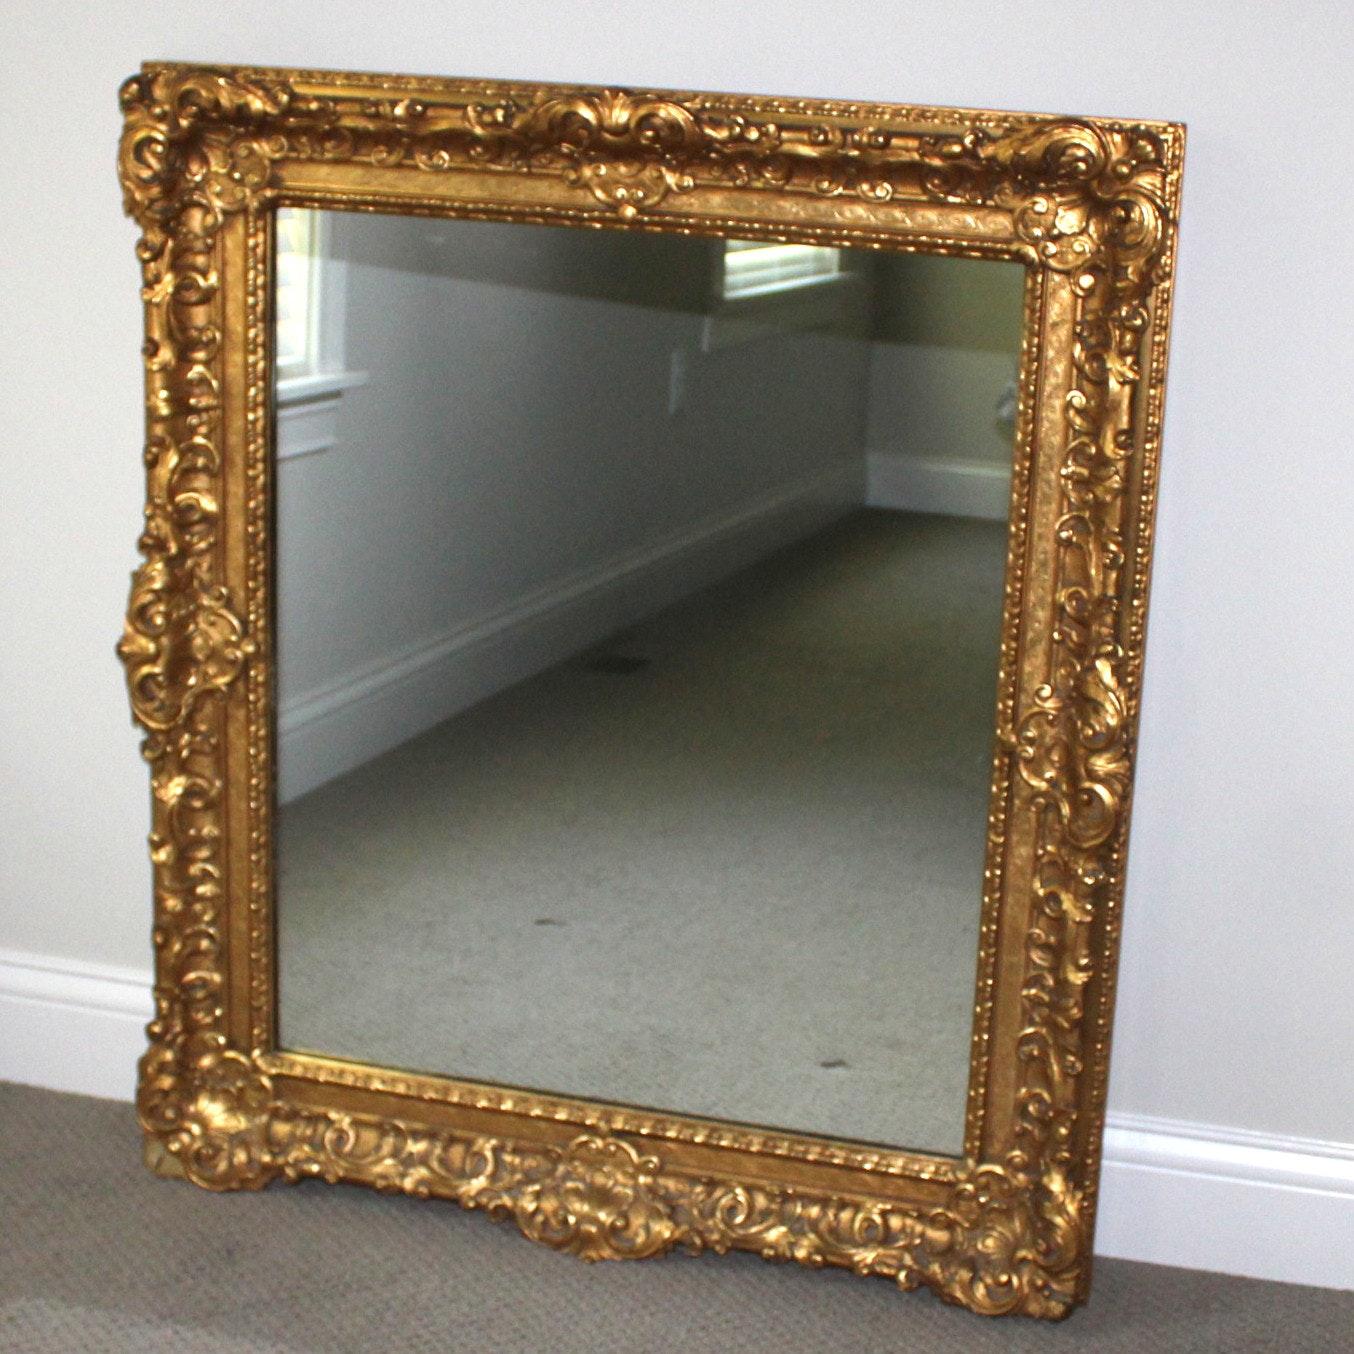 Ornate Gold-Tone Wall Mirror